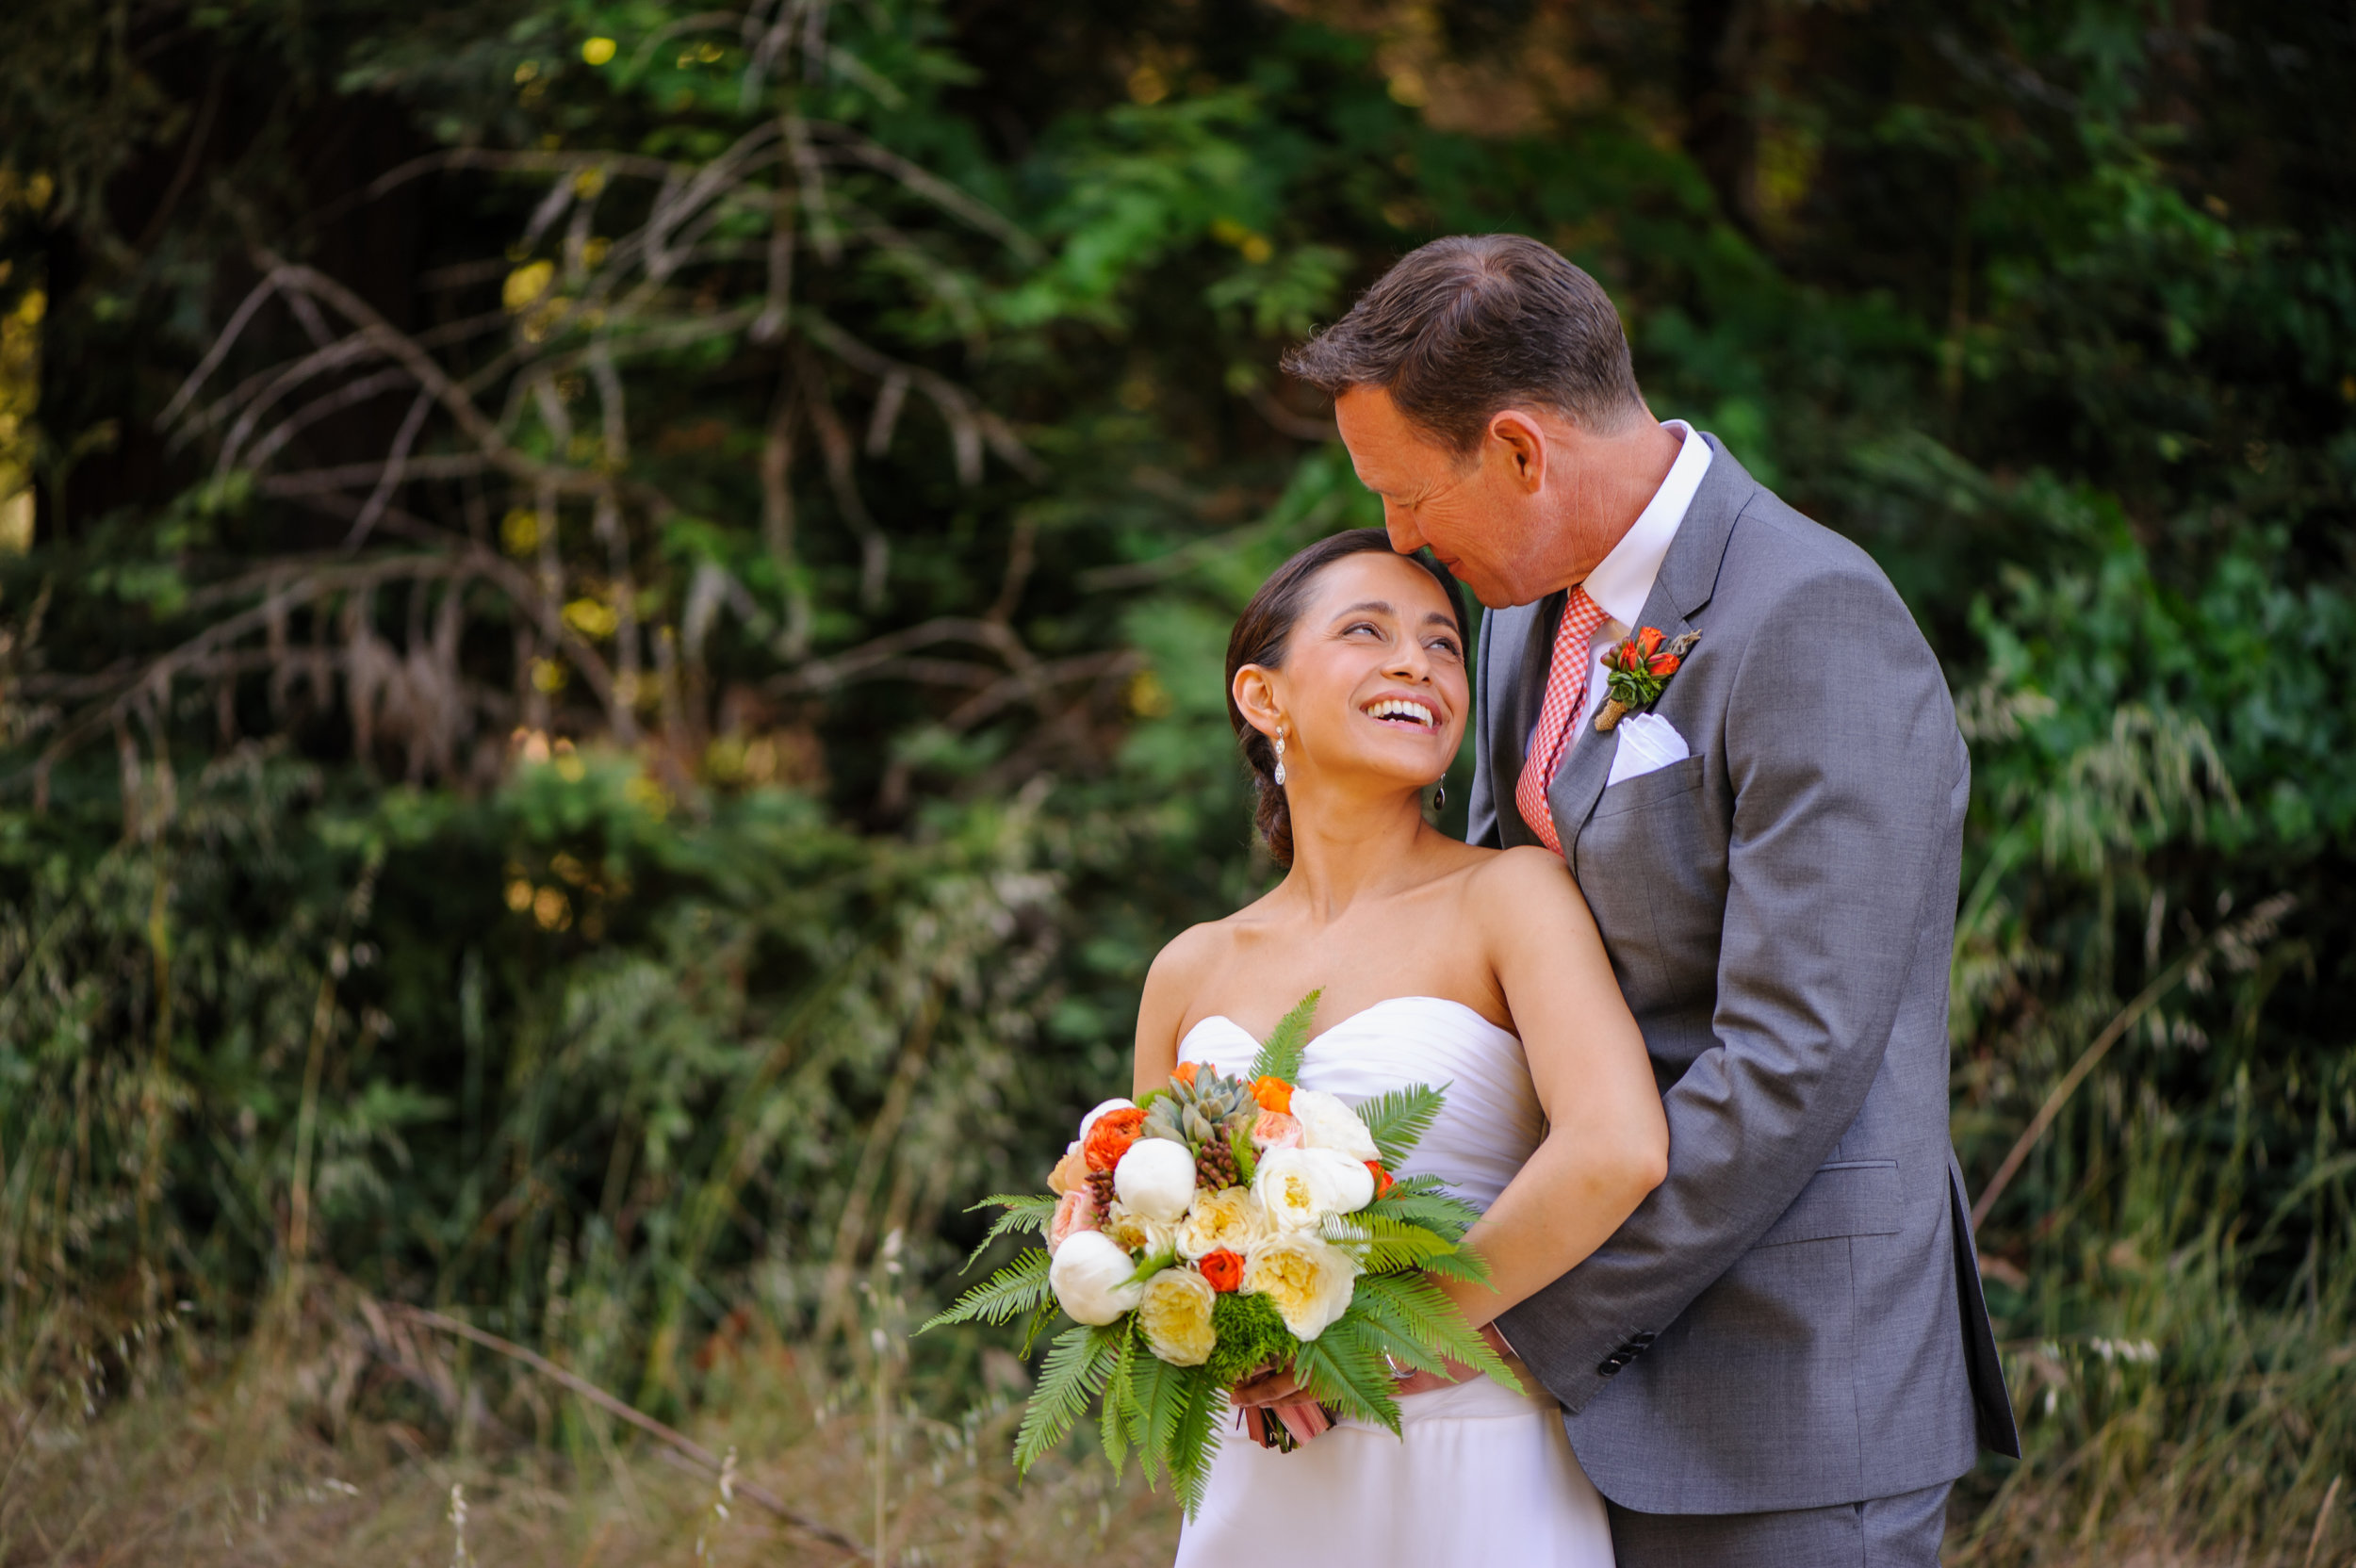 janet-jeremy-012-mountain-terrace-woodside-wedding-photographer-katherine-nicole-photography.JPG